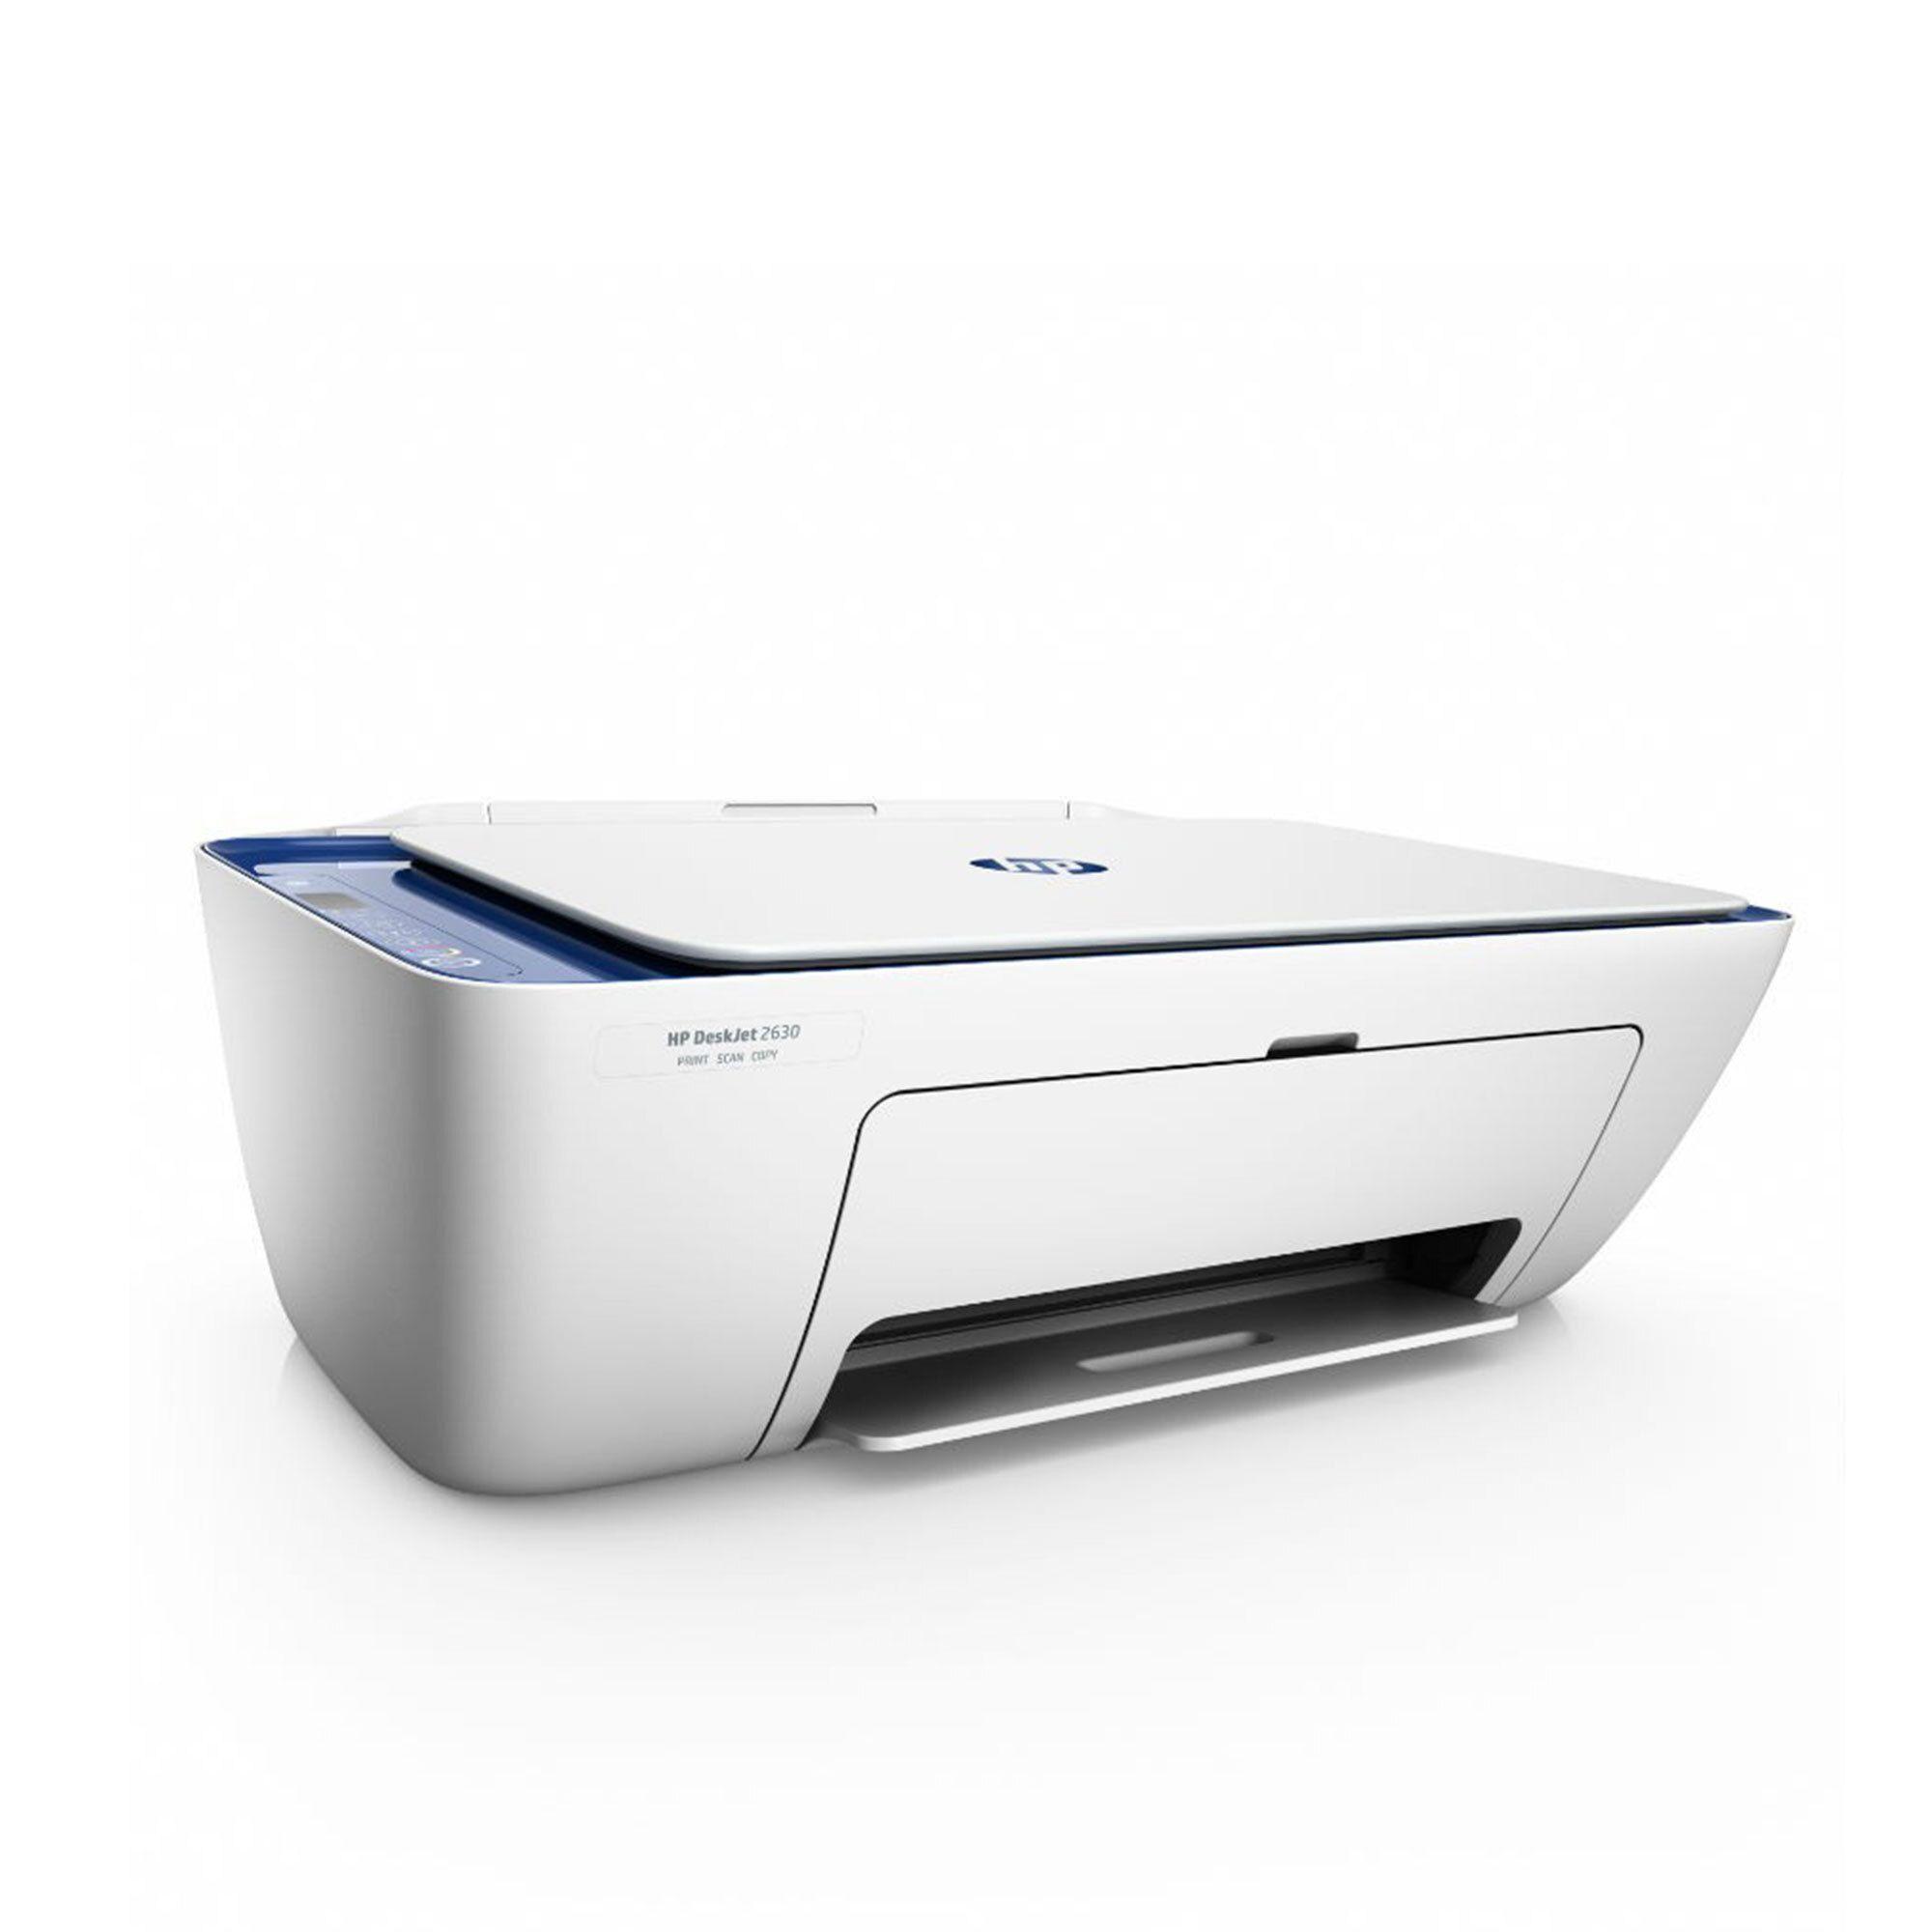 HP Deskjet 2630 stampante wireless a colori multifunzione 3in1